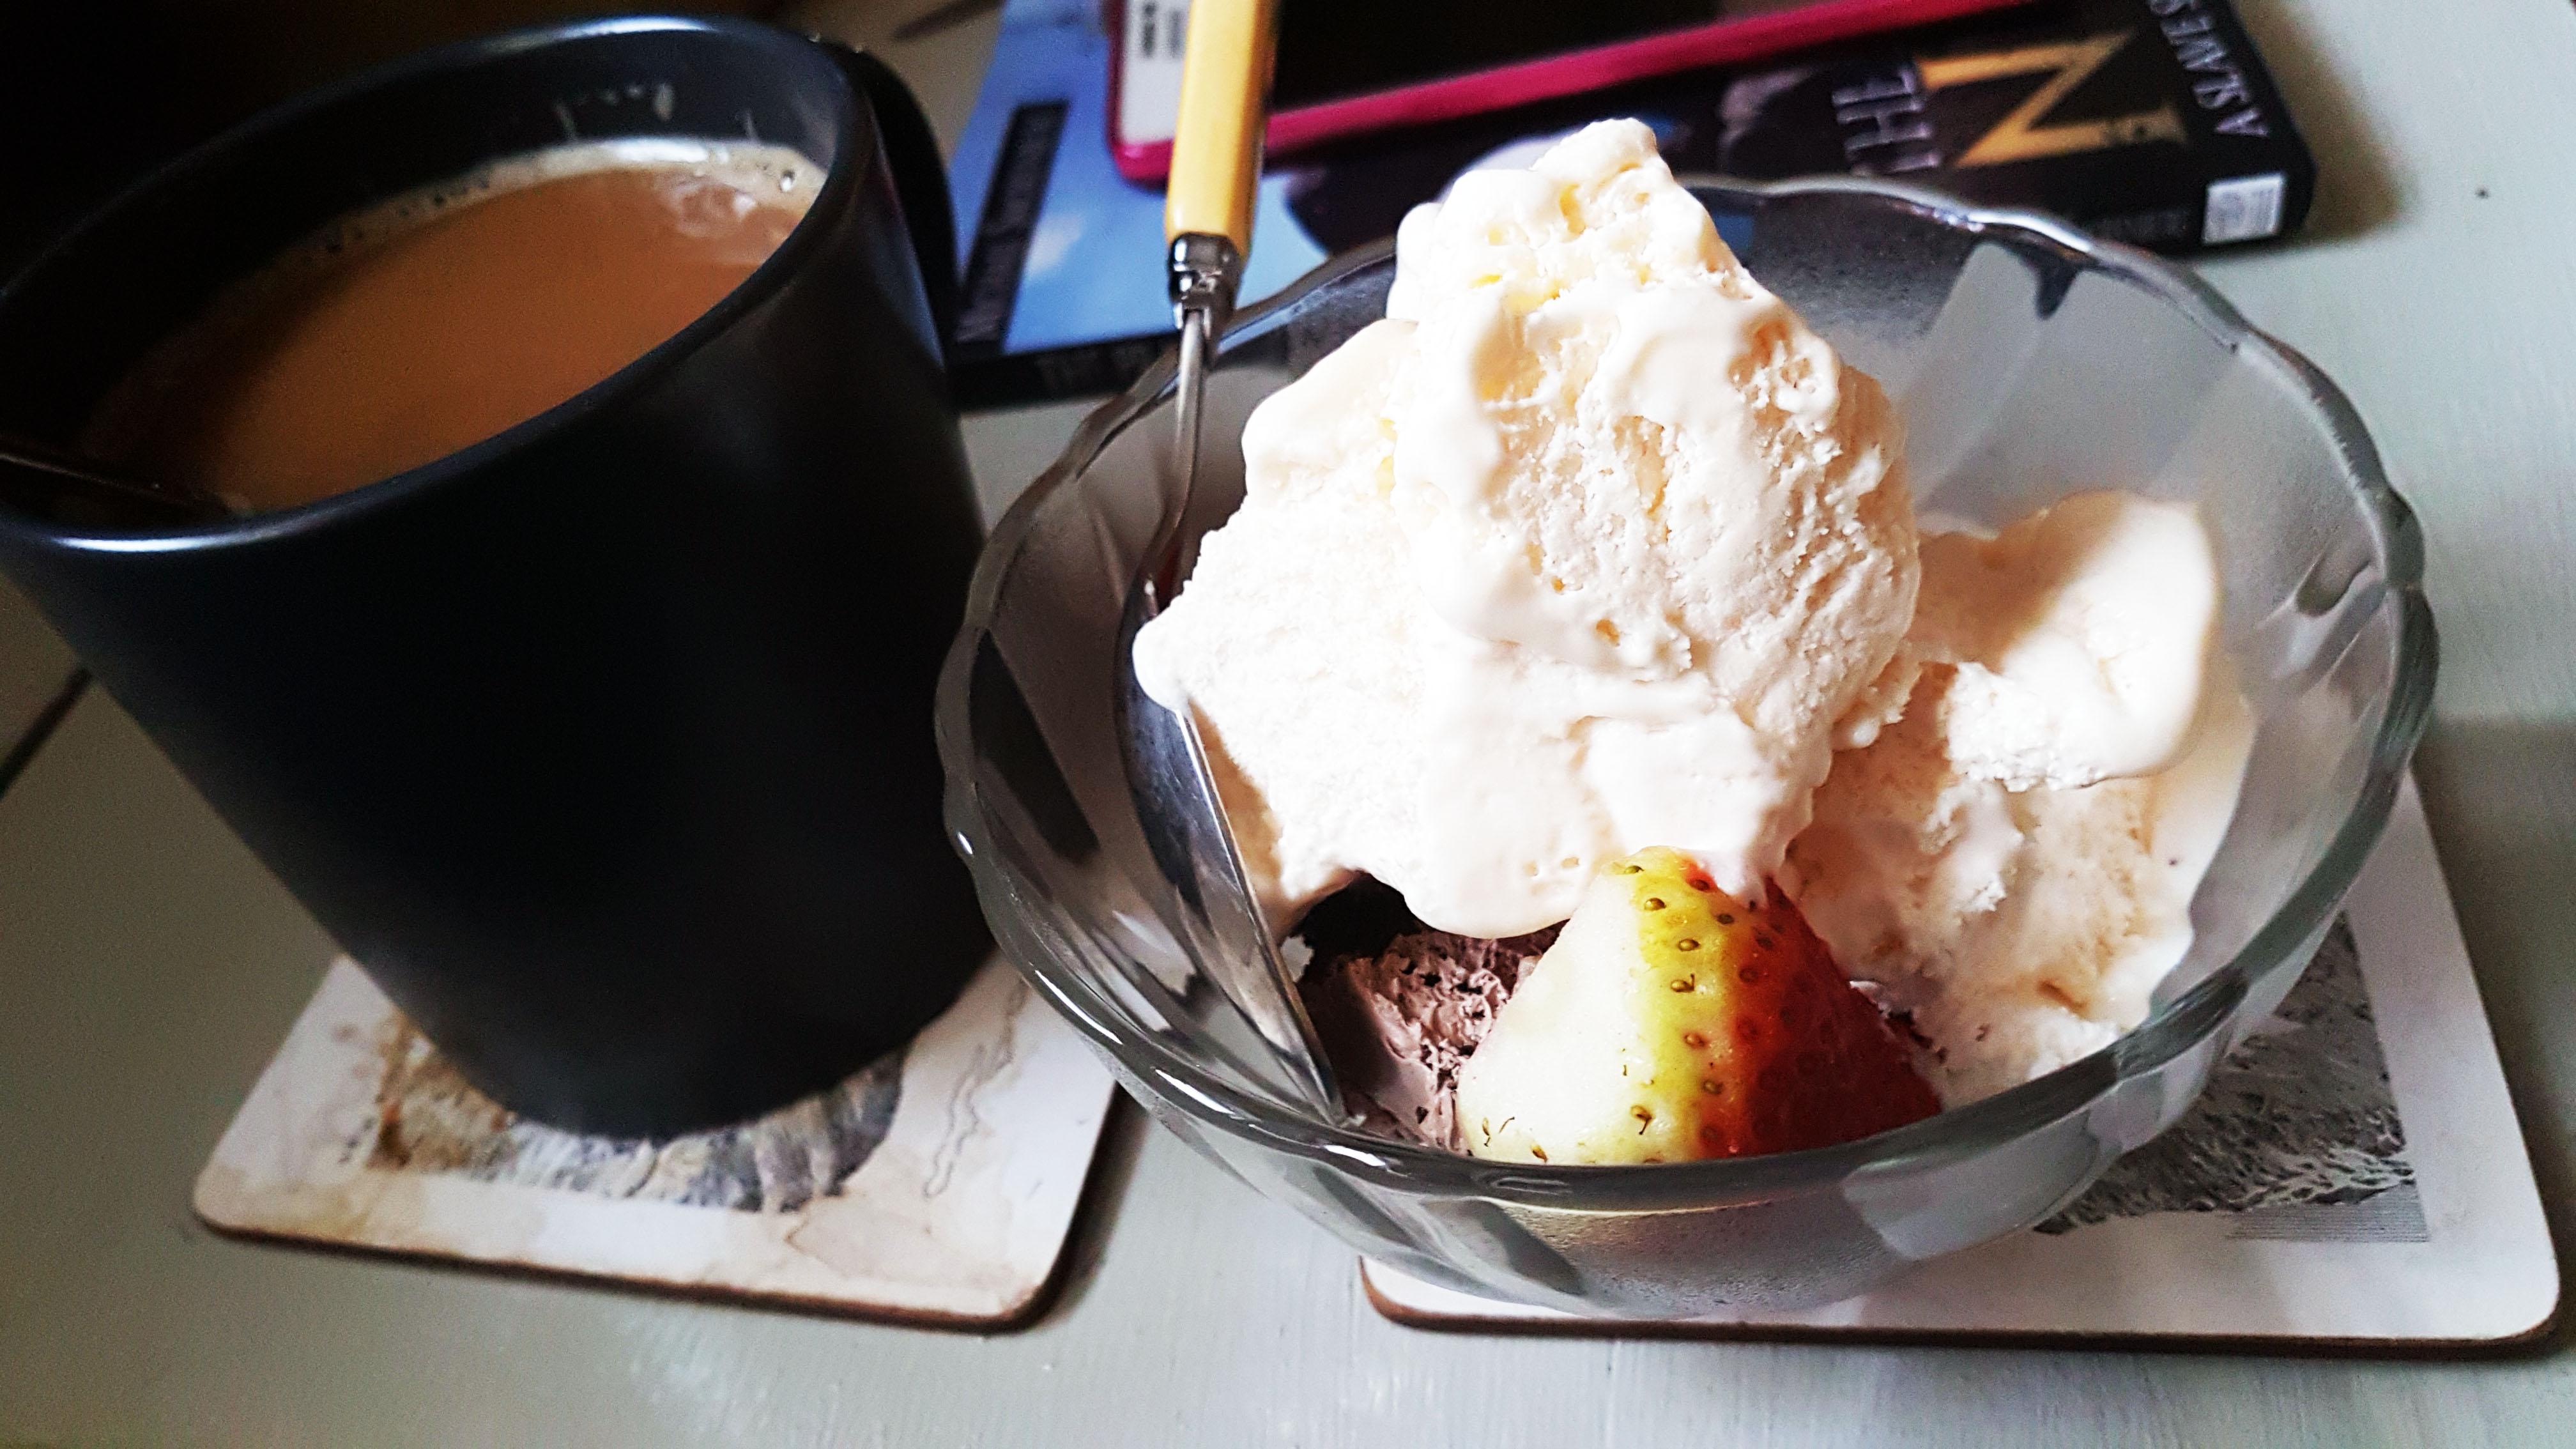 Strawberries, choc cake and ice cream with coffee for Sunday evening dessert at Mum's.